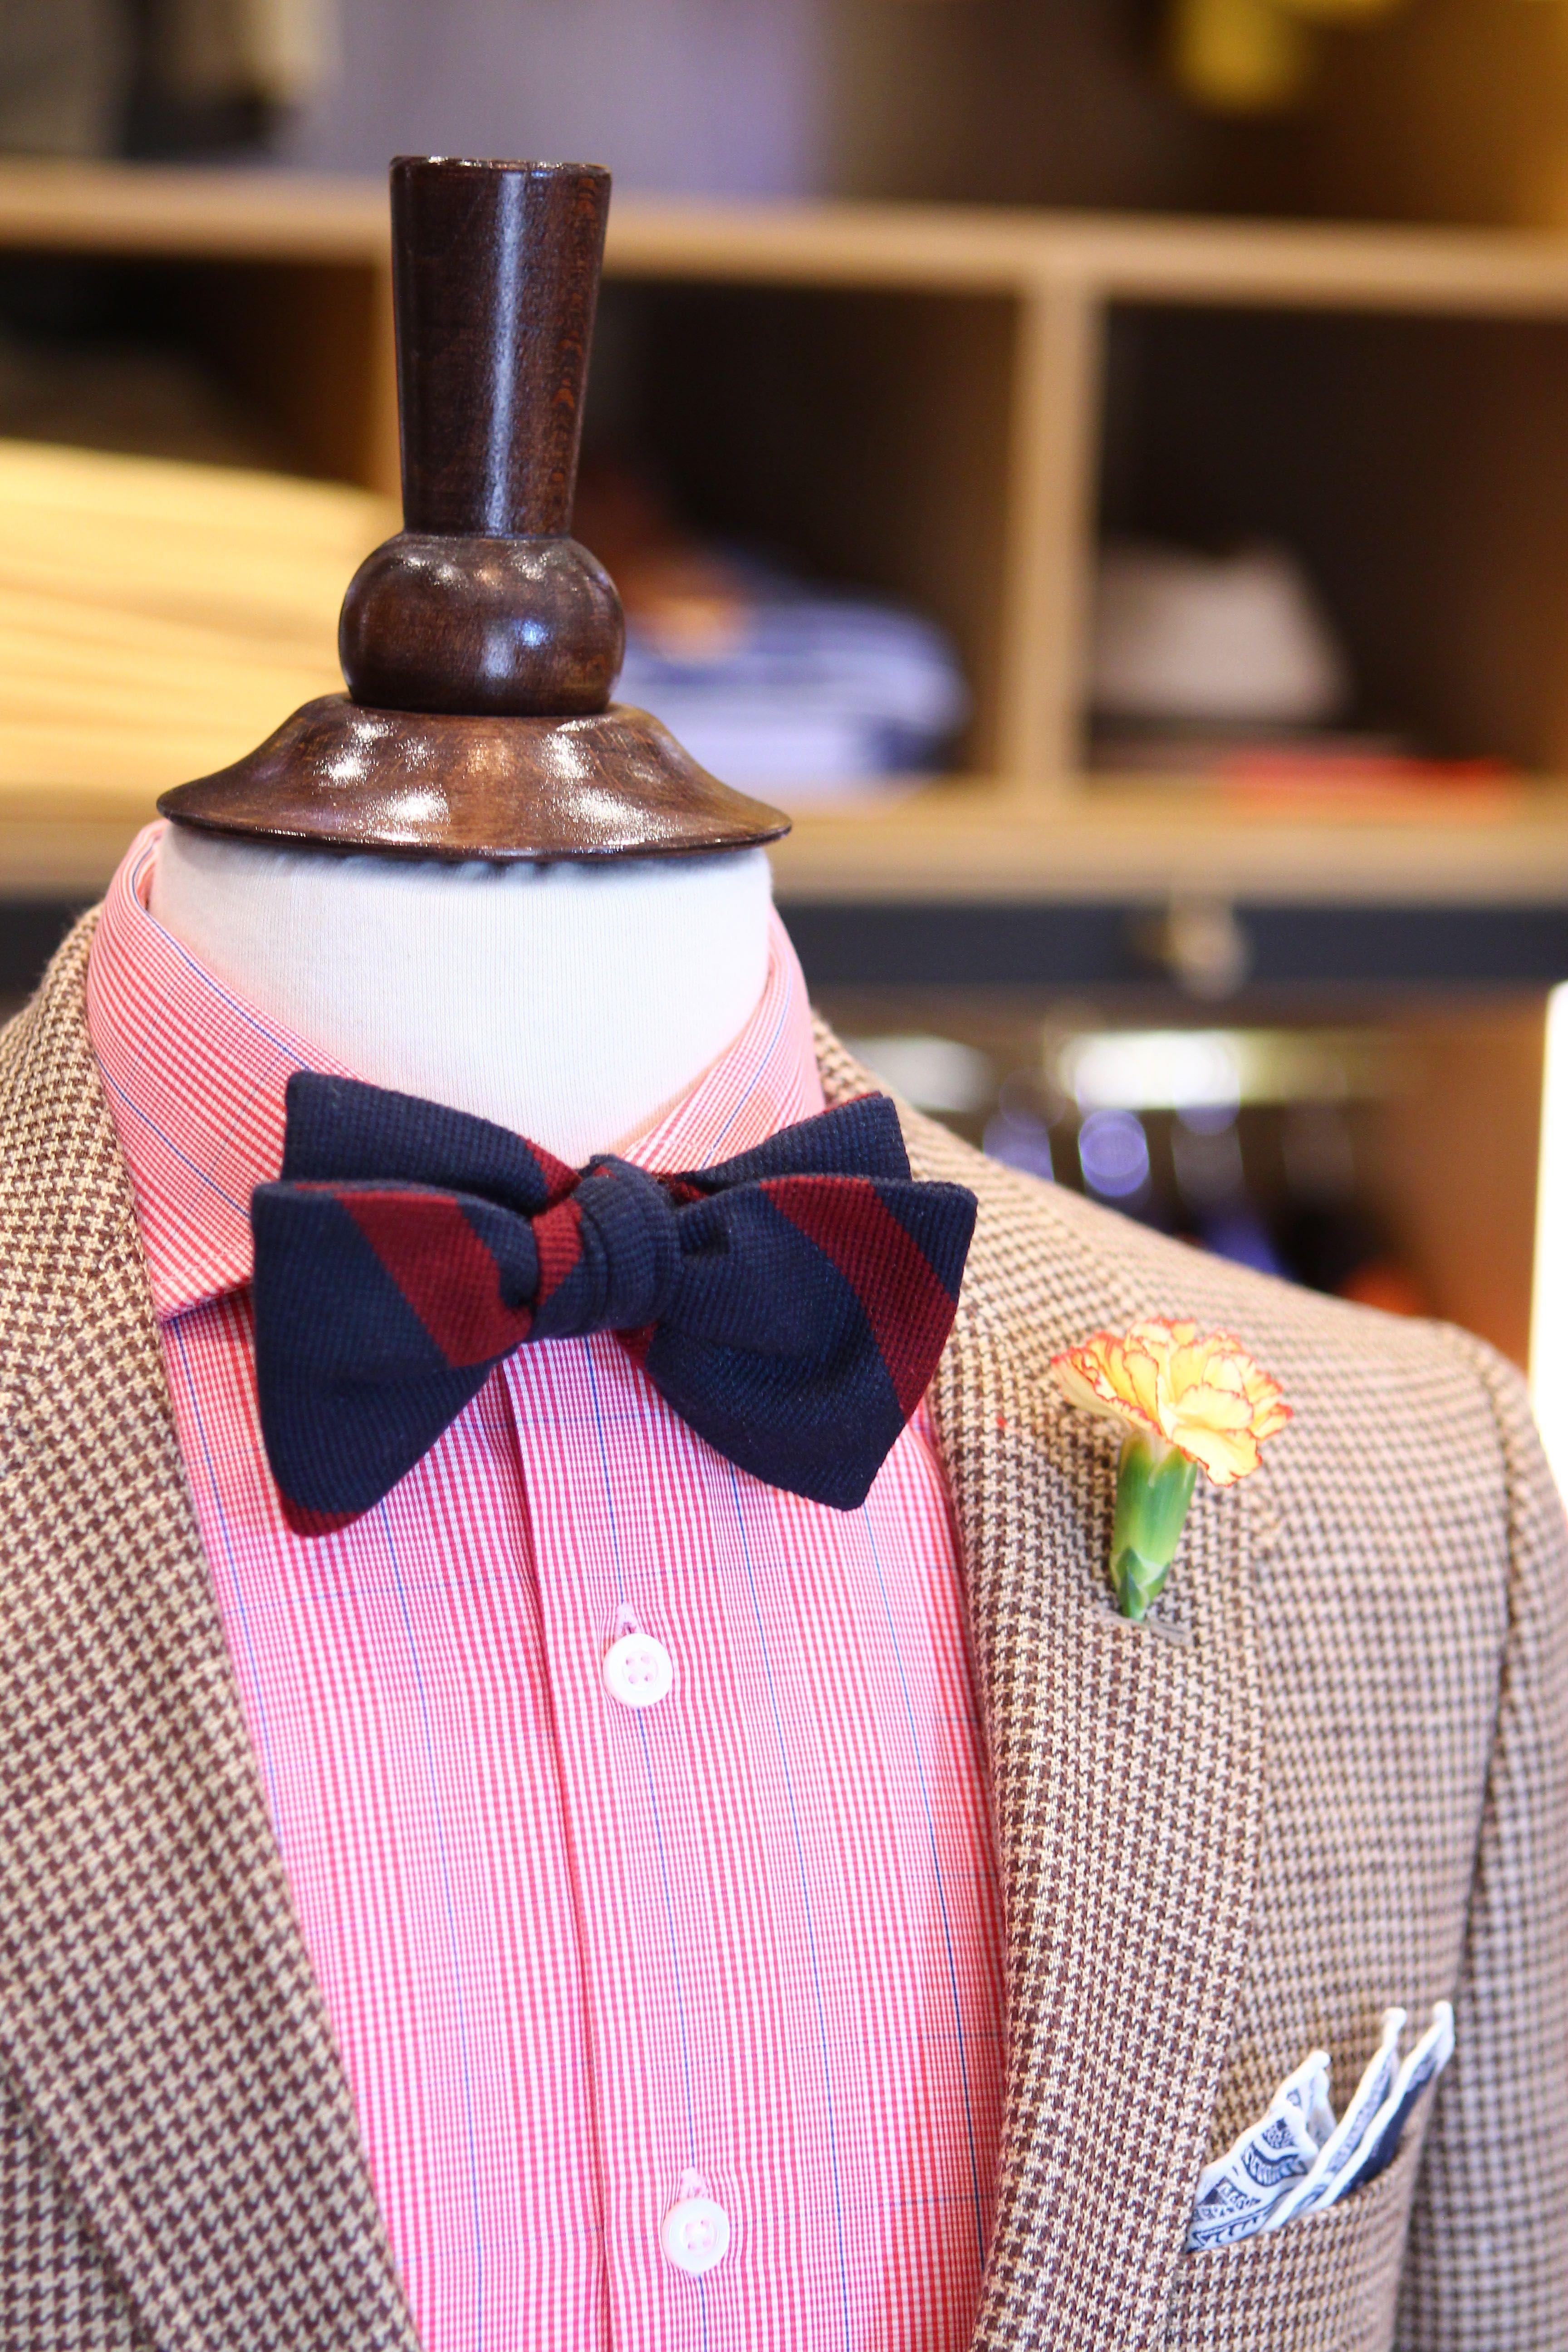 Beige Tweed Jacket Pink Glen Plaid Shirt Navy Bow Tie With Red Stripe